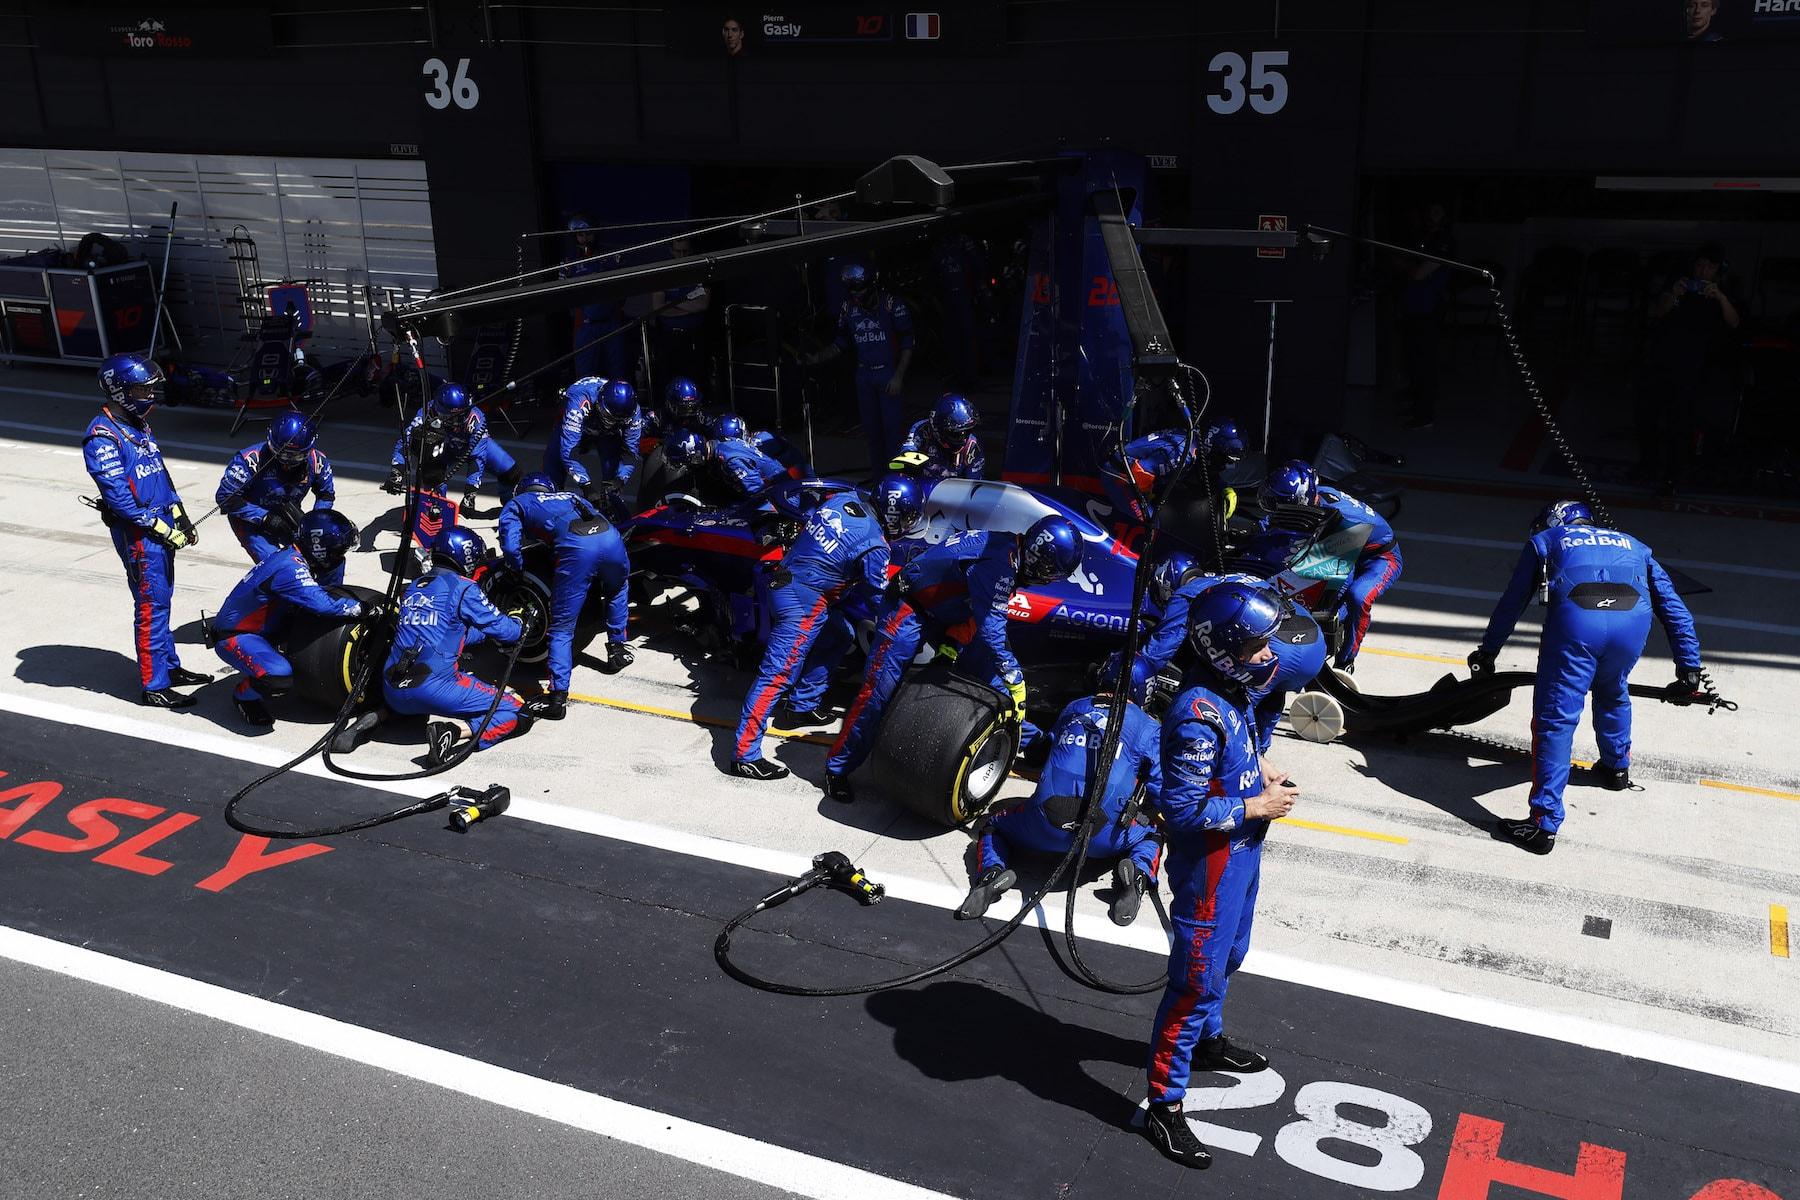 P 2018 Pierre Gasly | Toro Rosso STR13 | 2018 British GP 1 copy.jpg